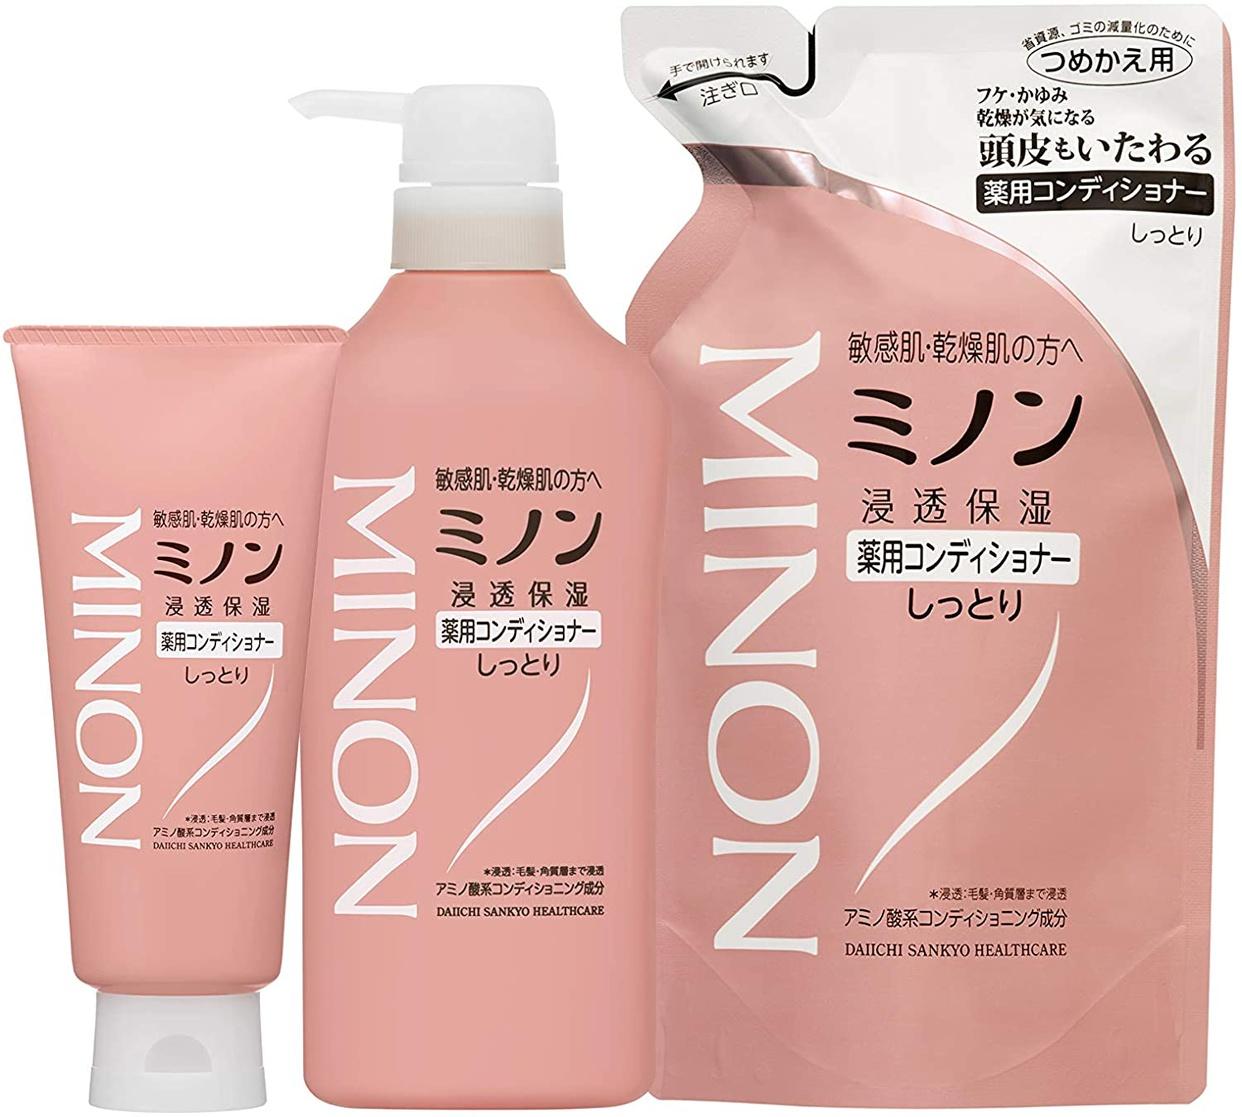 MINON(ミノン)薬用コンディショナー